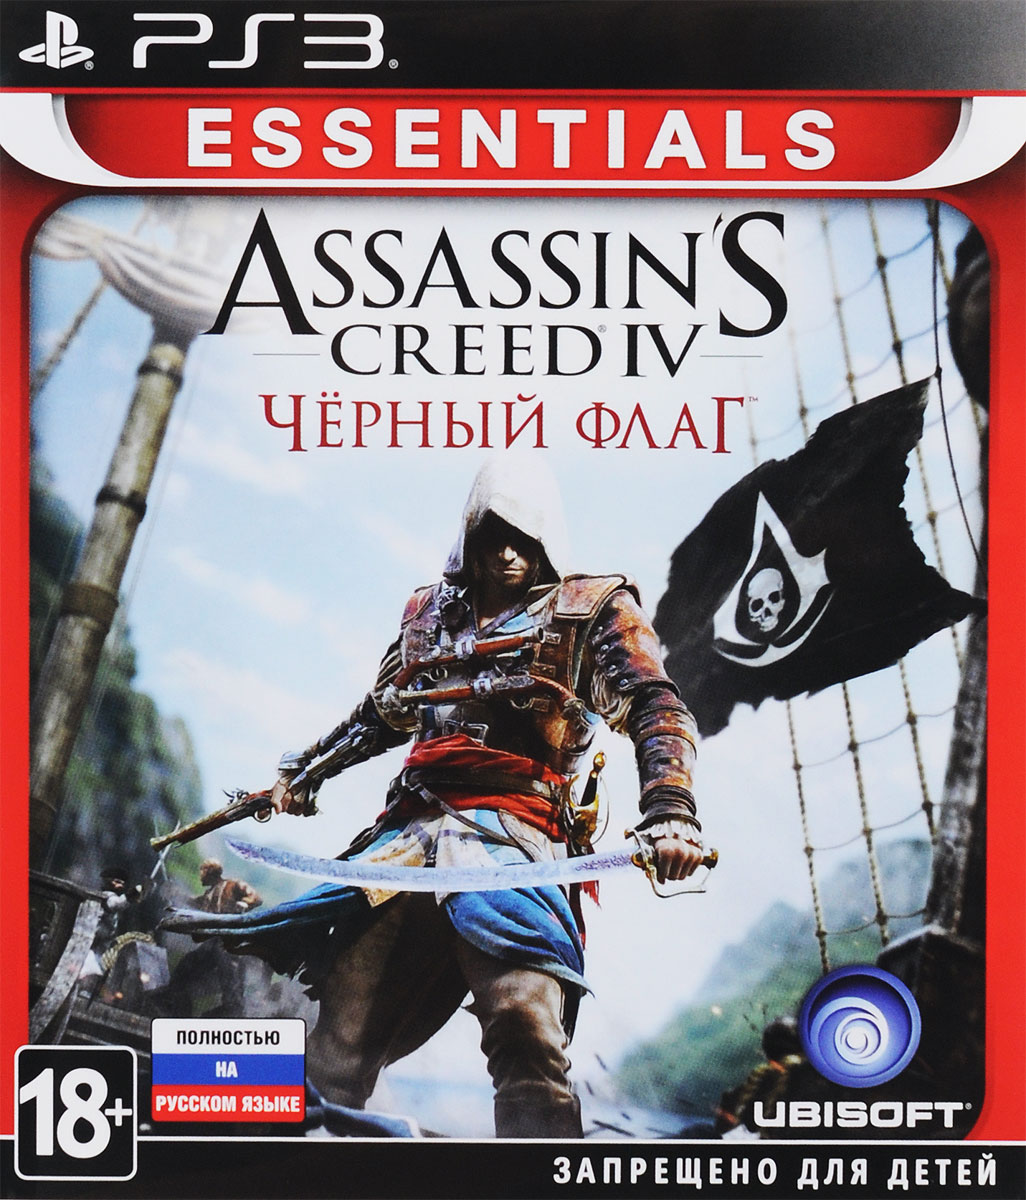 Assassin's Creed 4. Черный Флаг. Essentials (PS3) assassin s creed 4 black flag essentials [ps3]